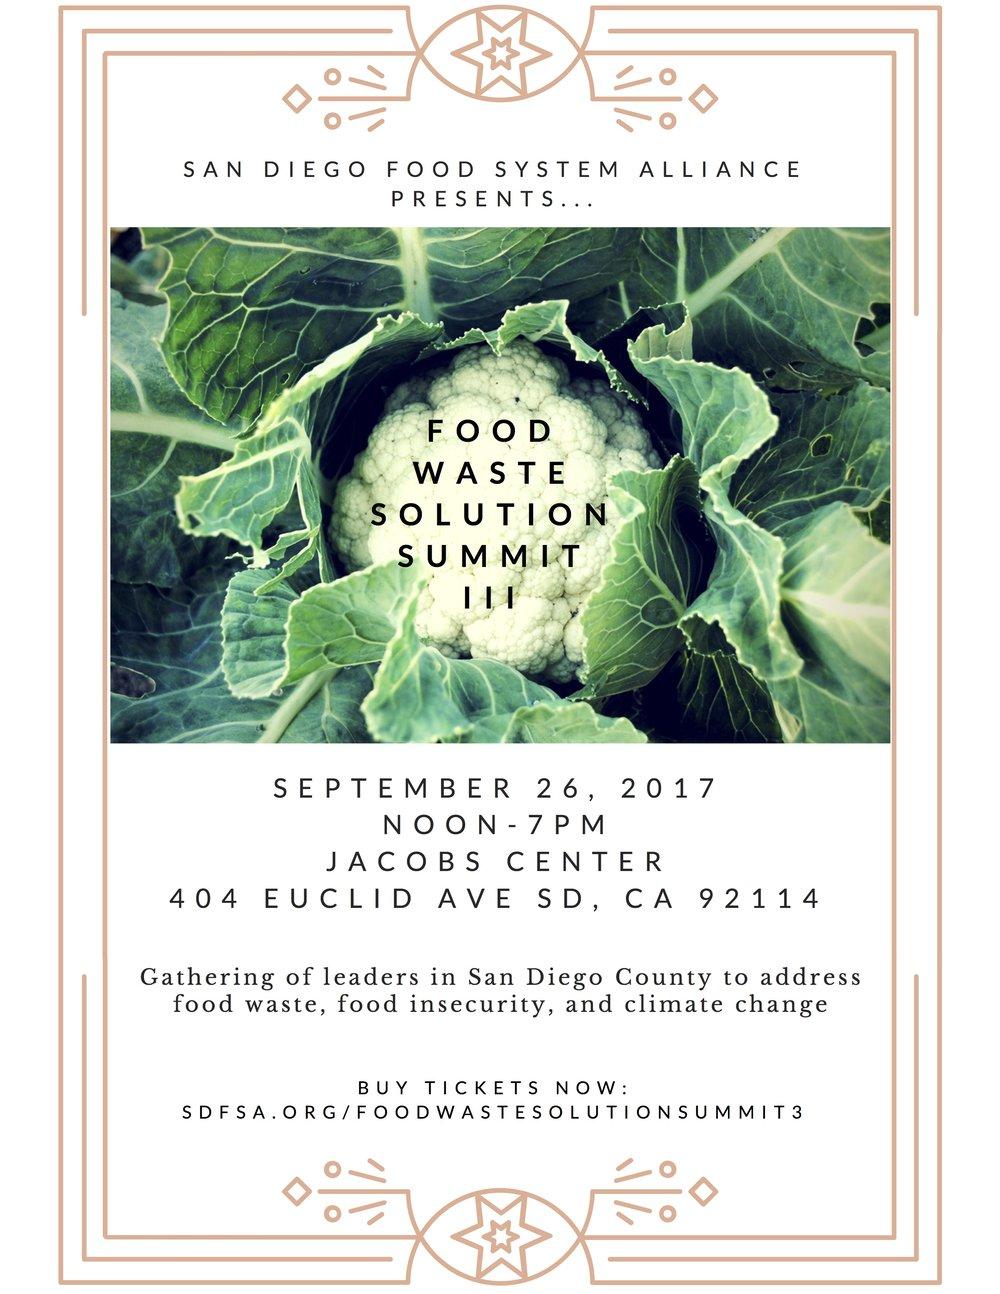 food waste solutions summit